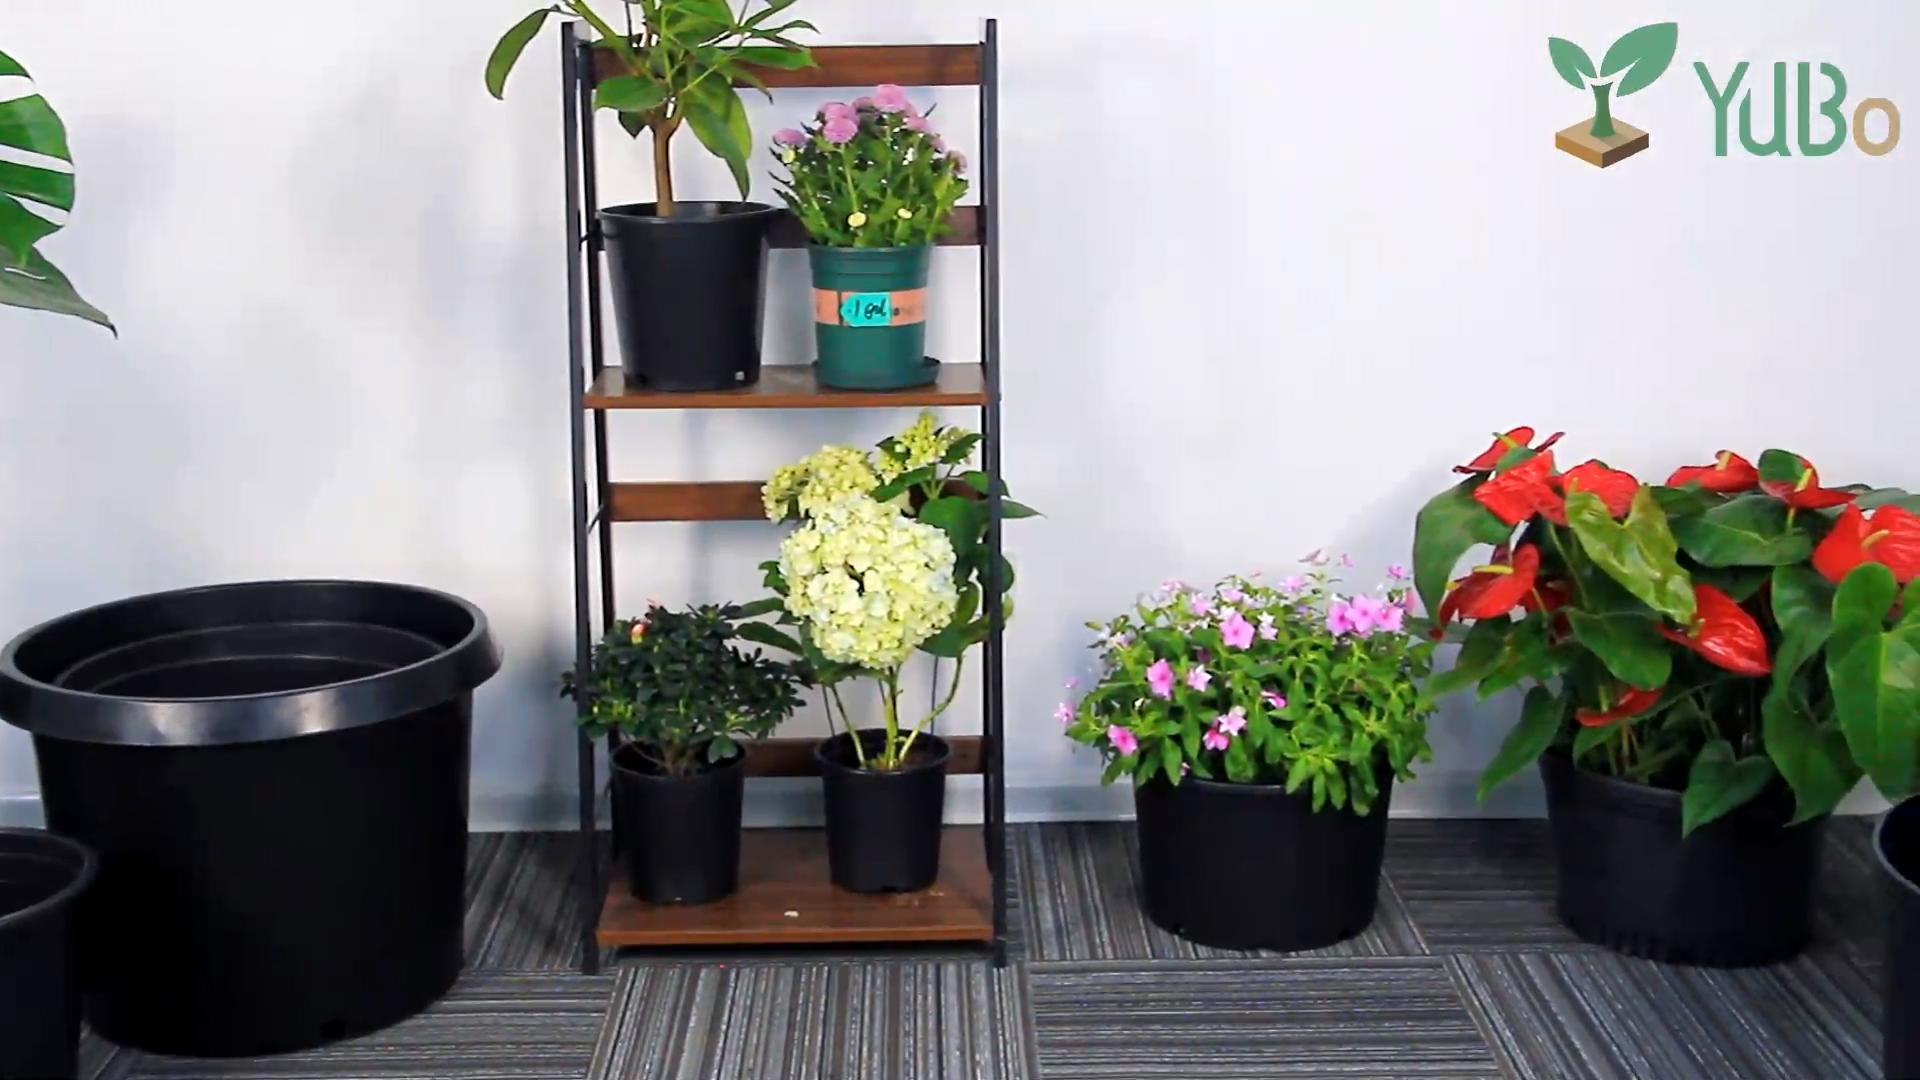 cheap plastic 1 gallon pot outdoor, black plastic nursery flowers